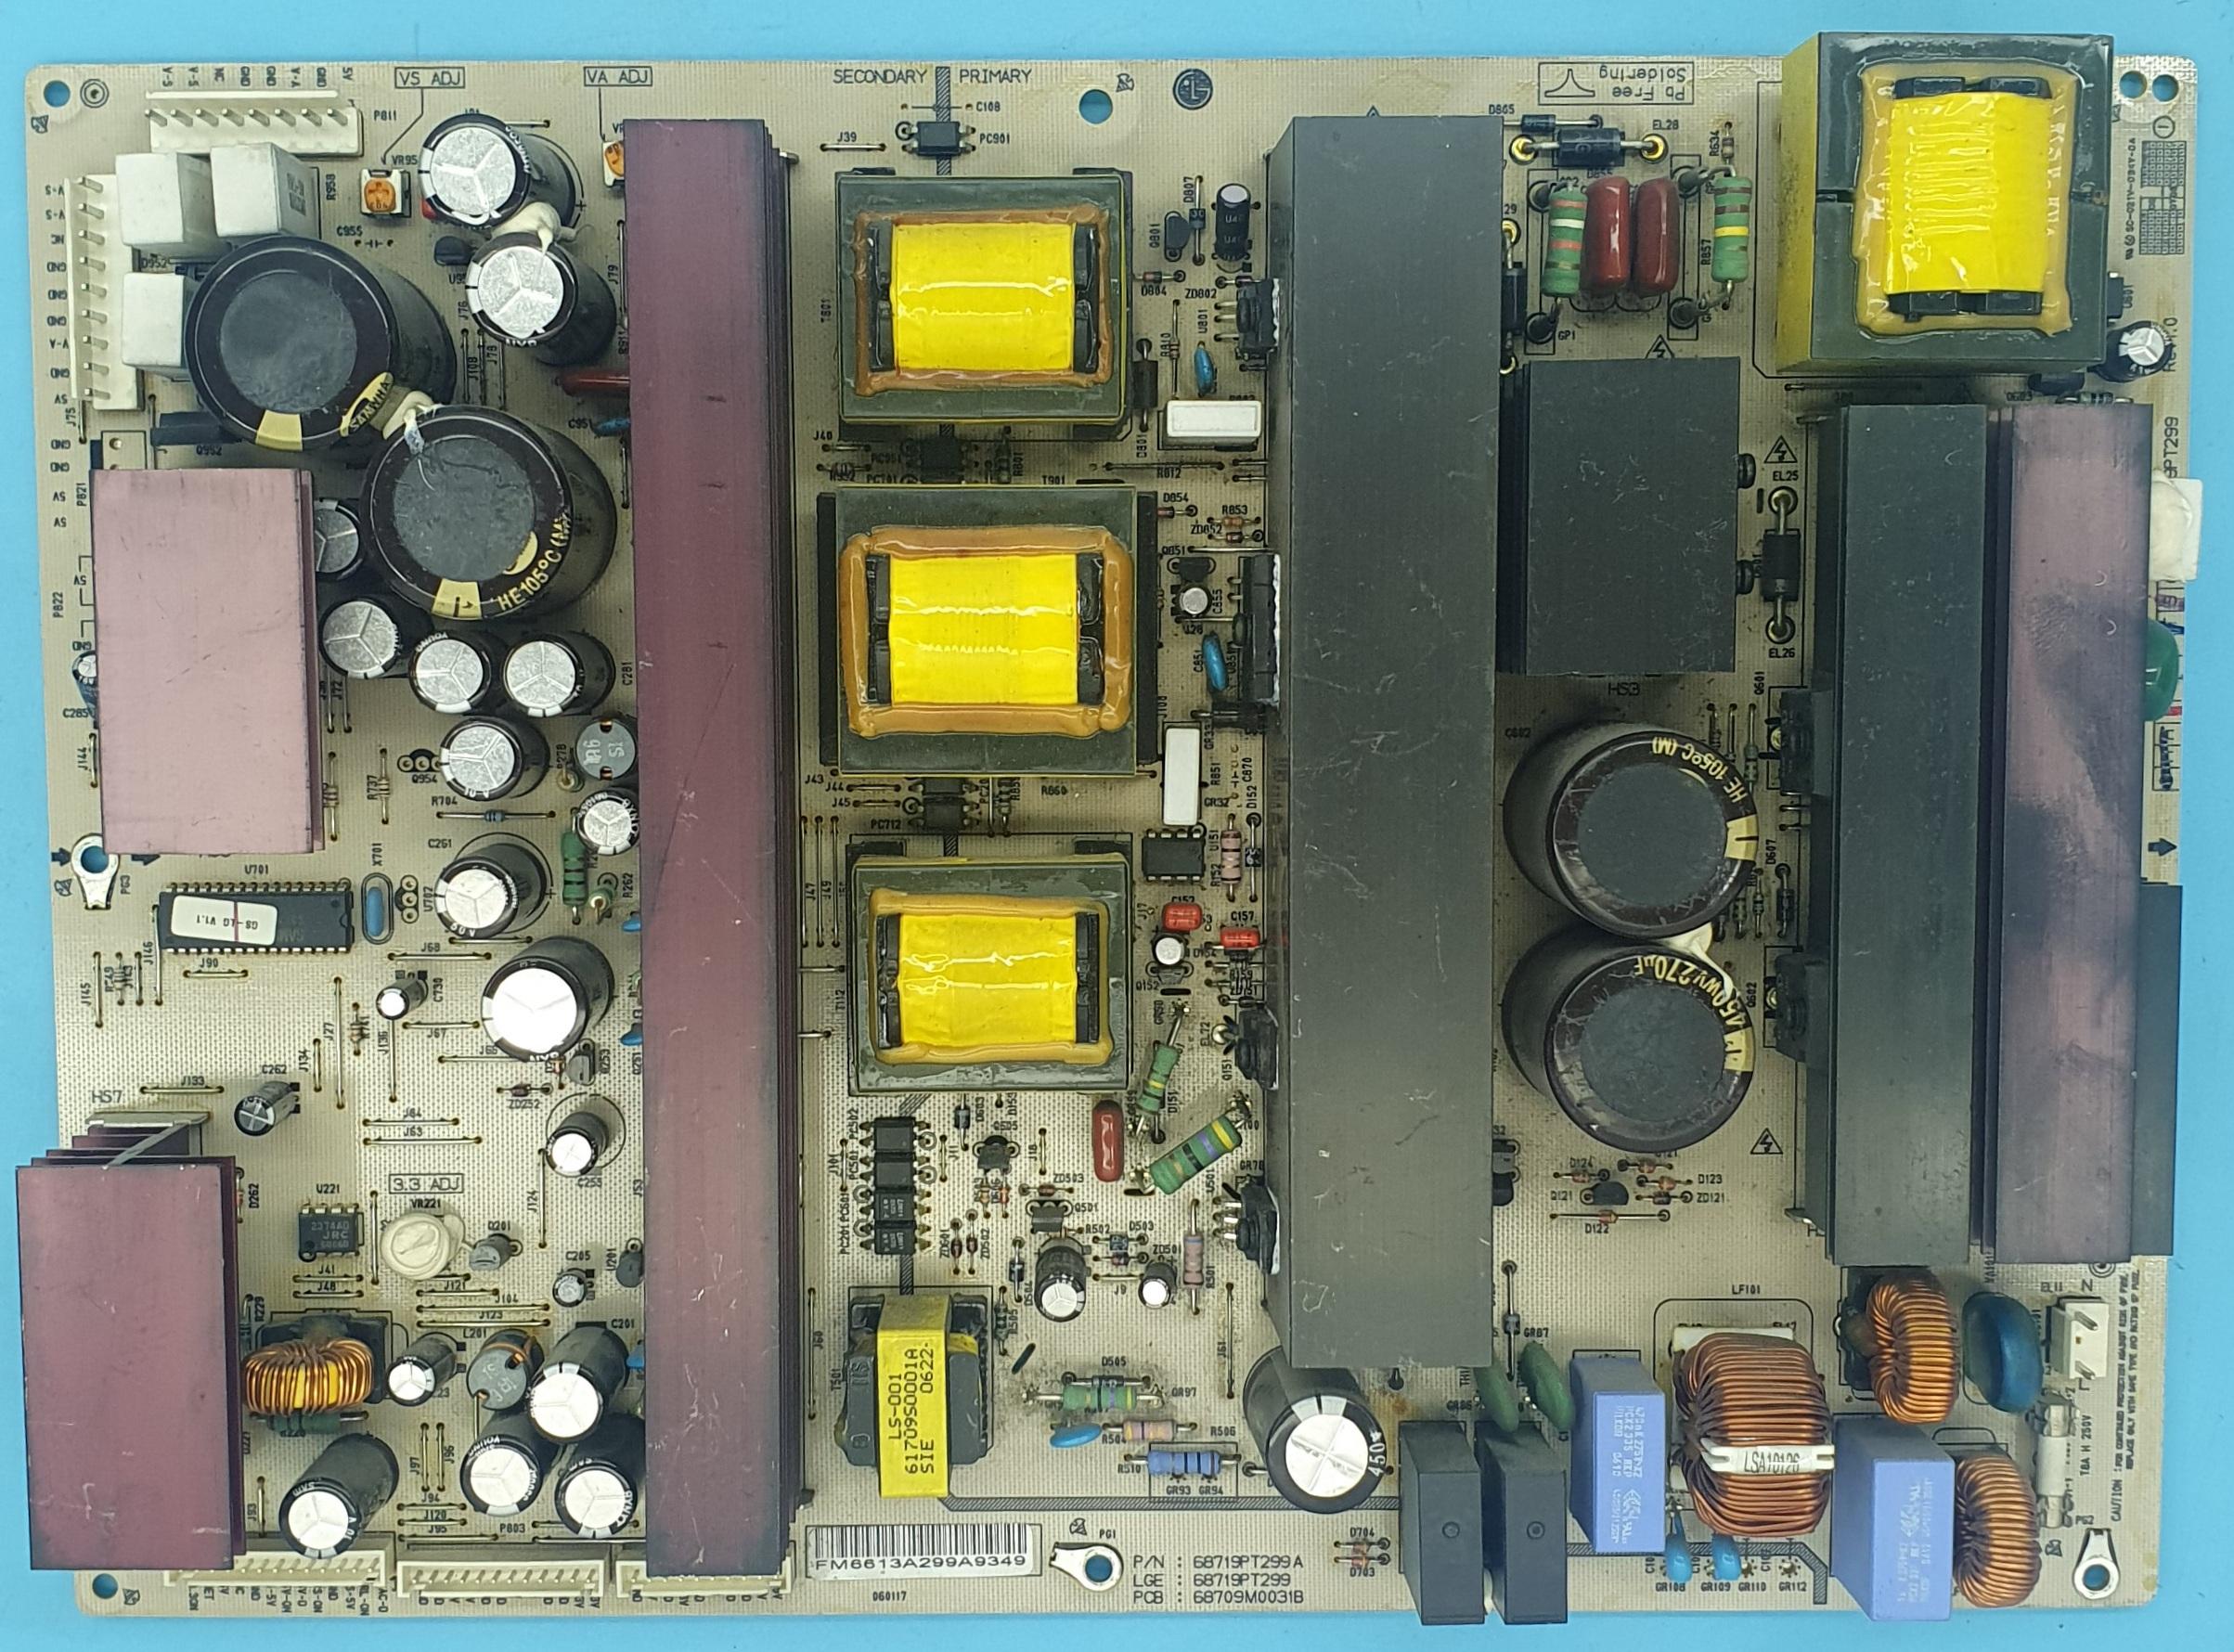 68719PT299A LG Power (KDV DAHİL = 150 TL)